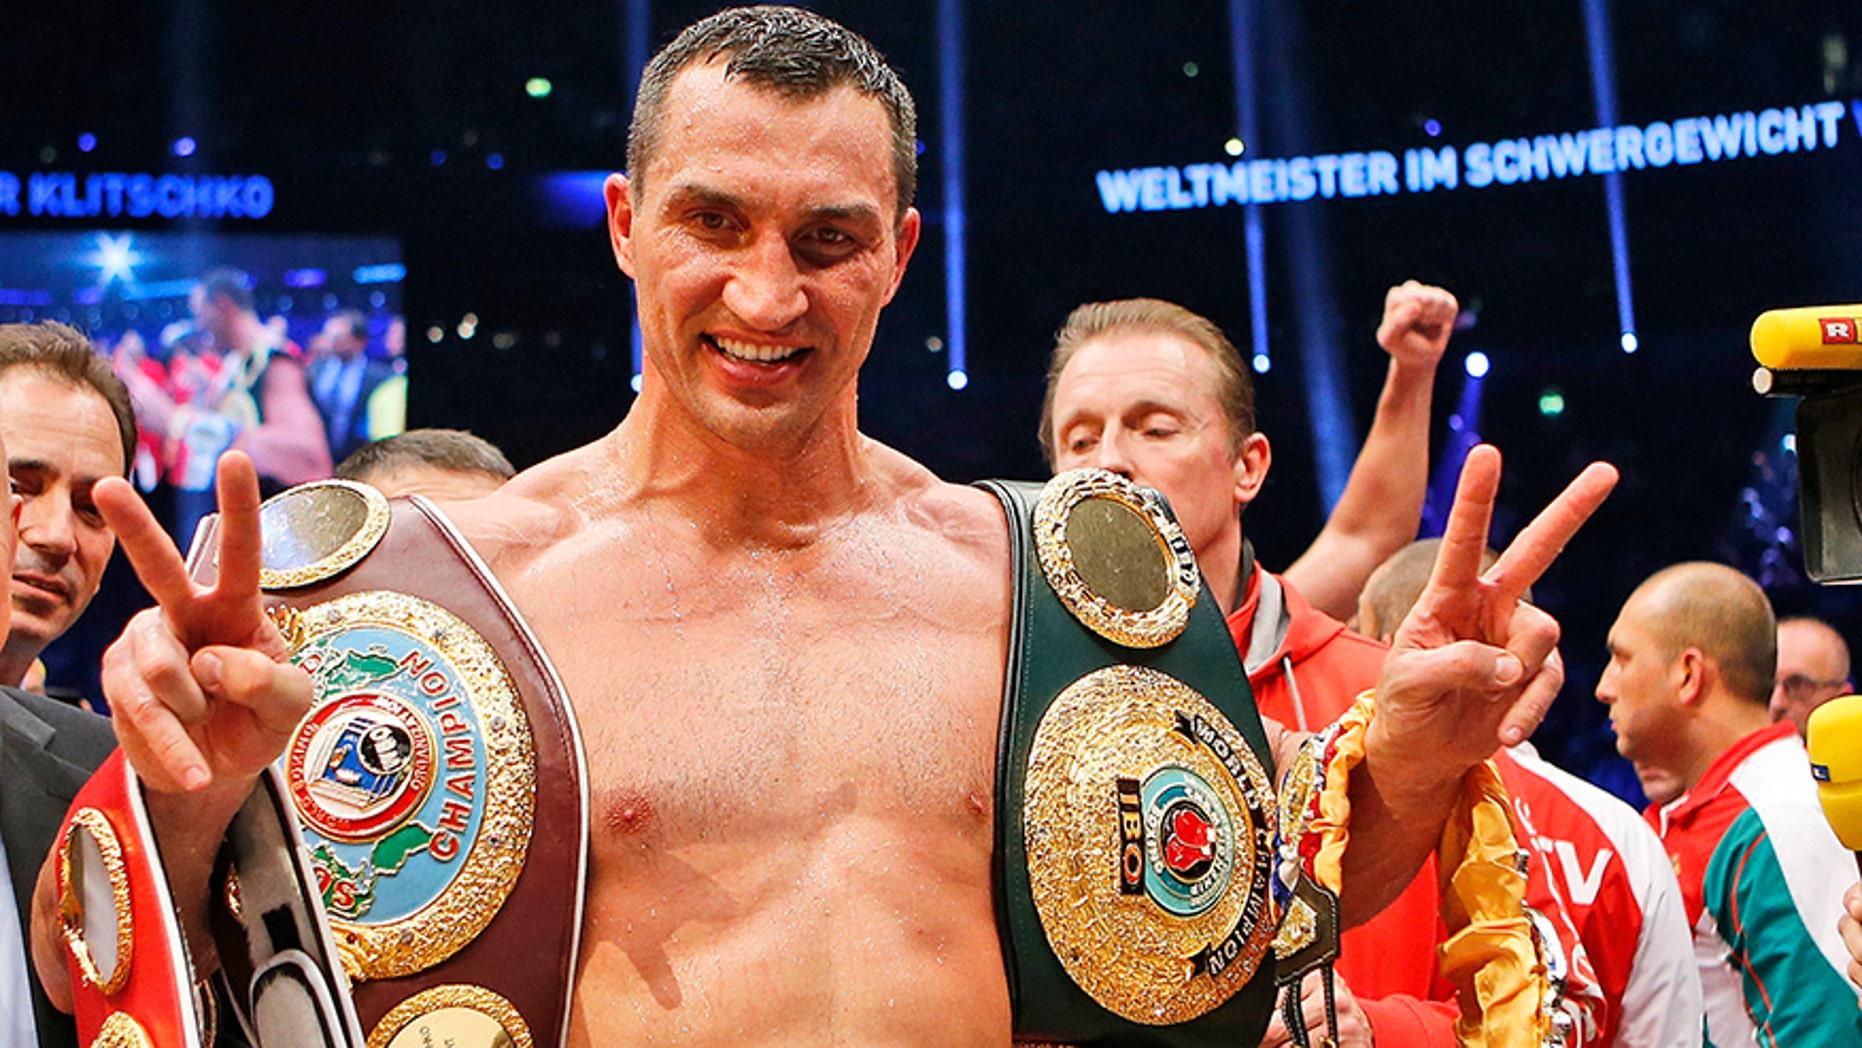 Former heavyweight world champion Wladimir Klitschko has announced his retirement from boxing.